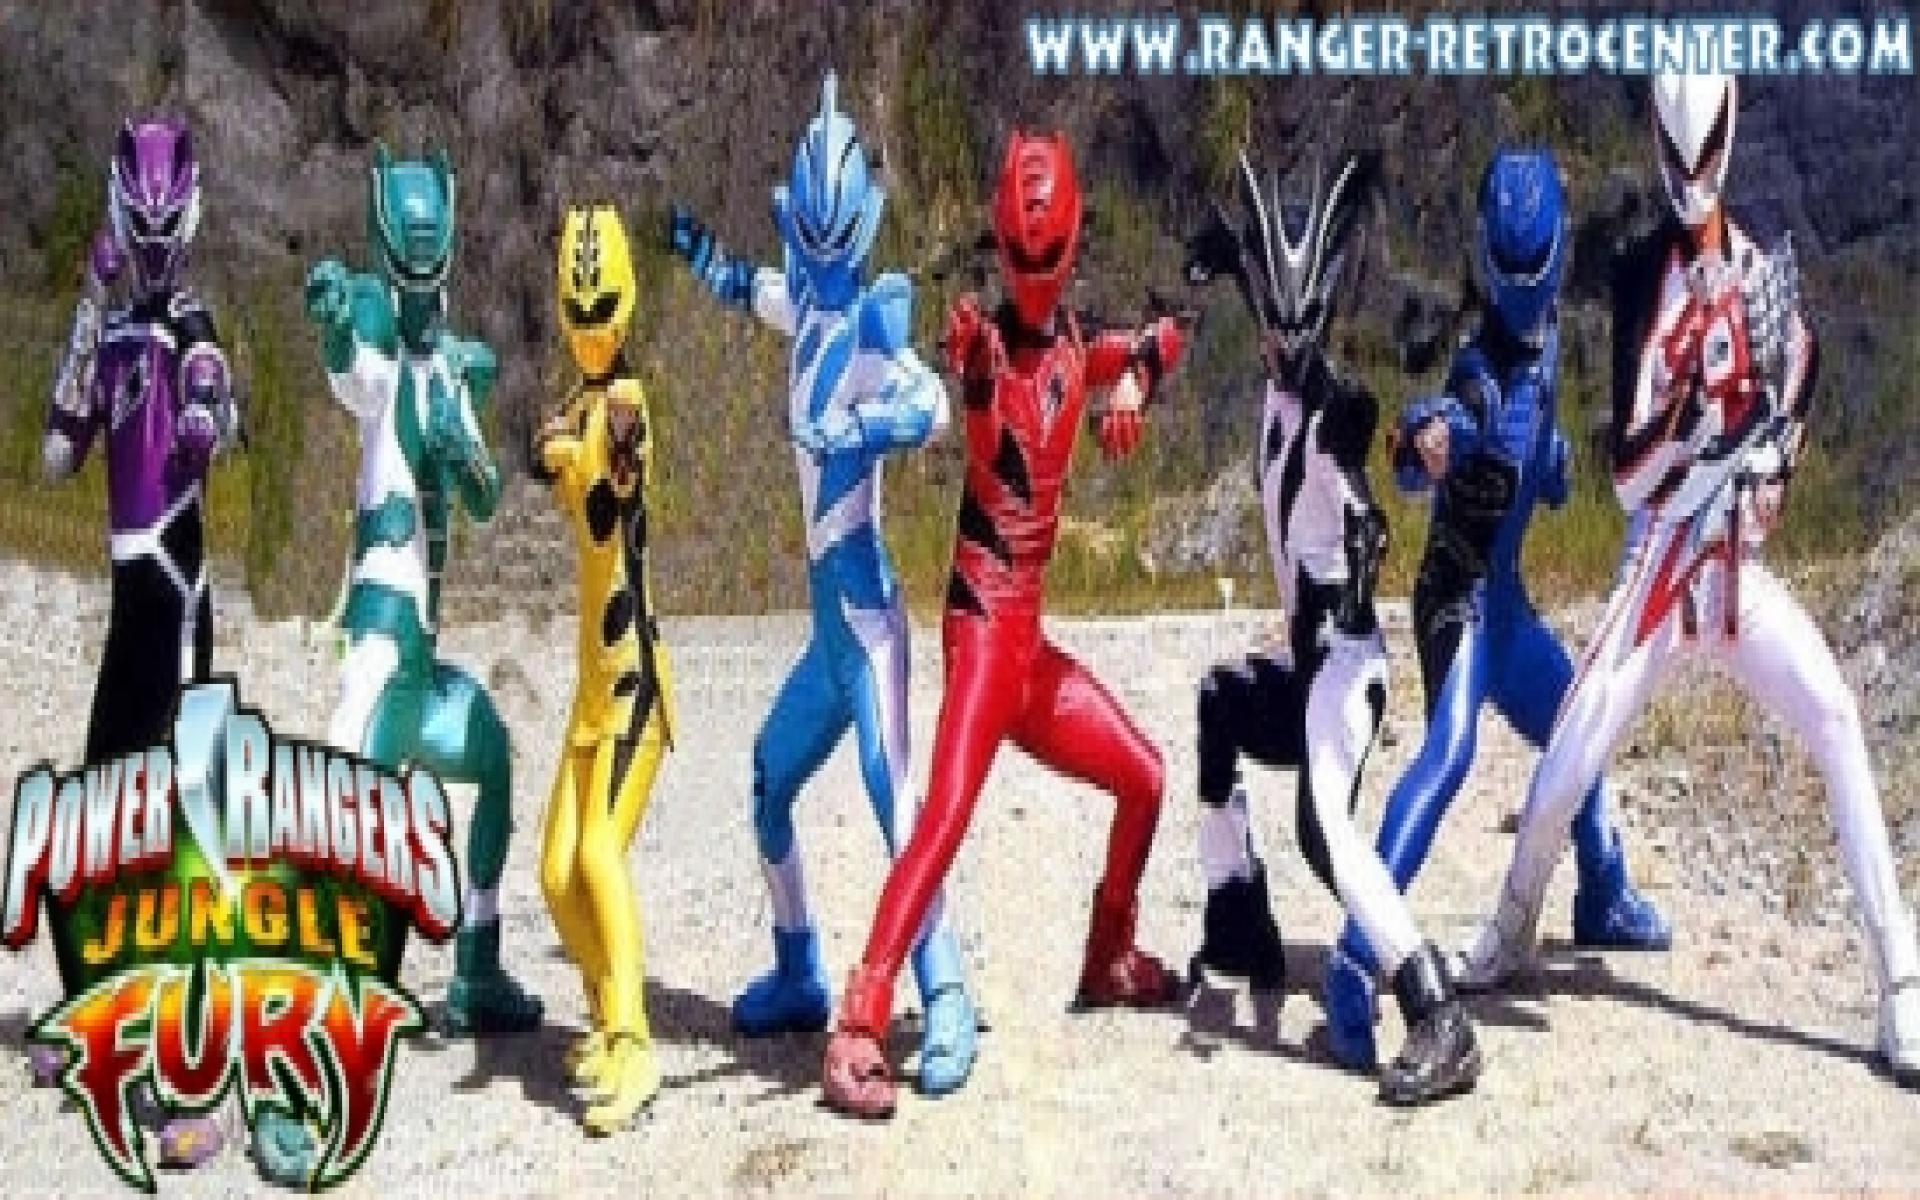 Power Rangers Jungle Fury Wallpapers Wallpaper Cave